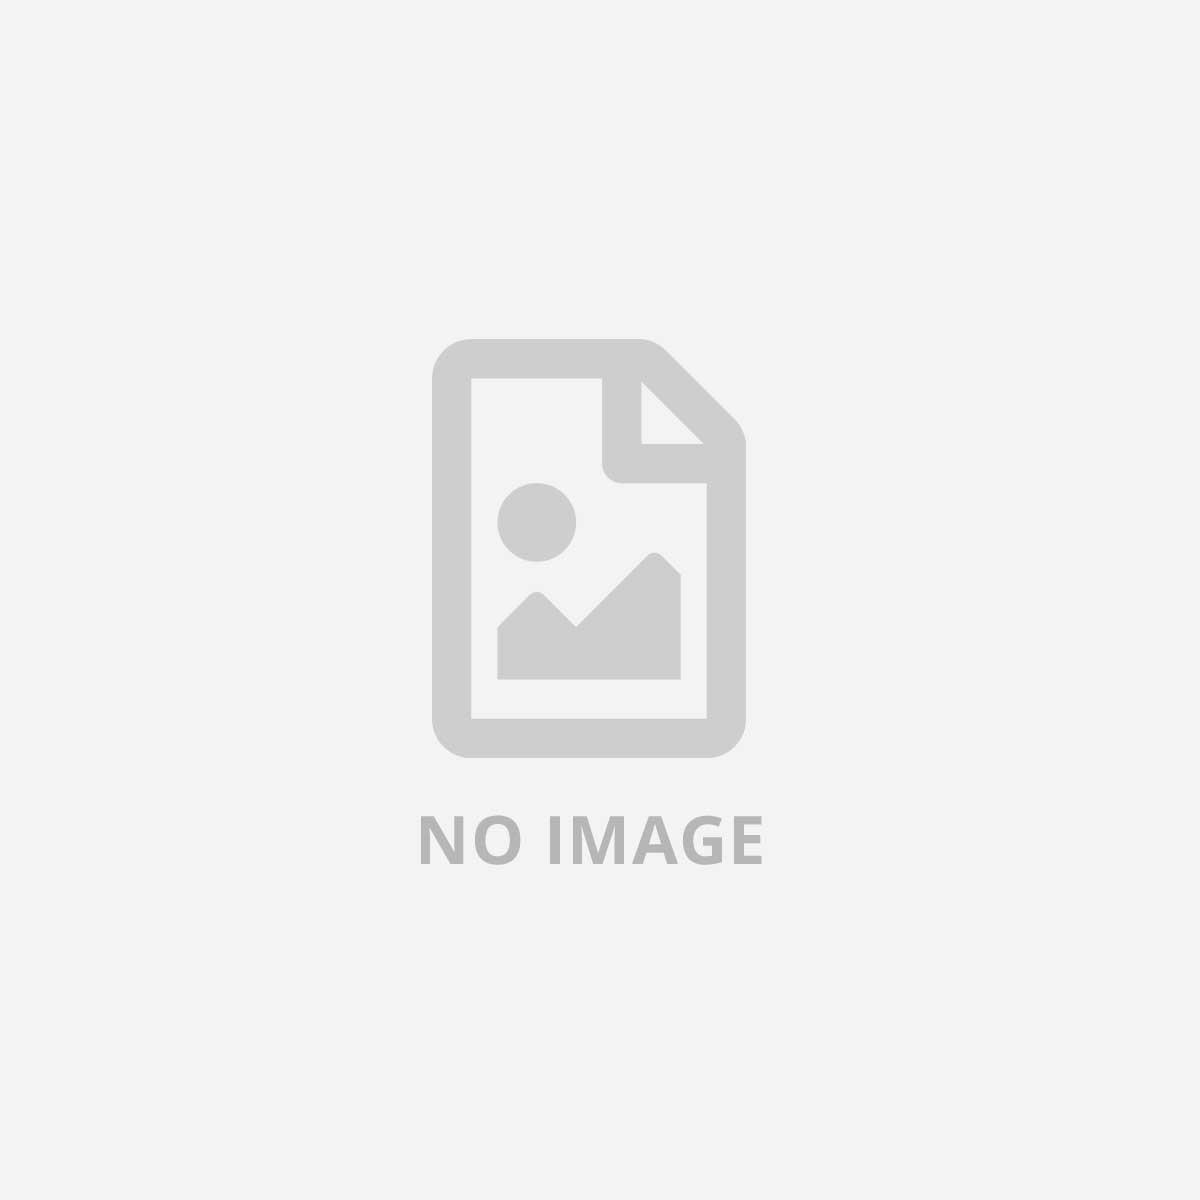 HPE MSA 1050 12GB SAS DC LFF STORAG